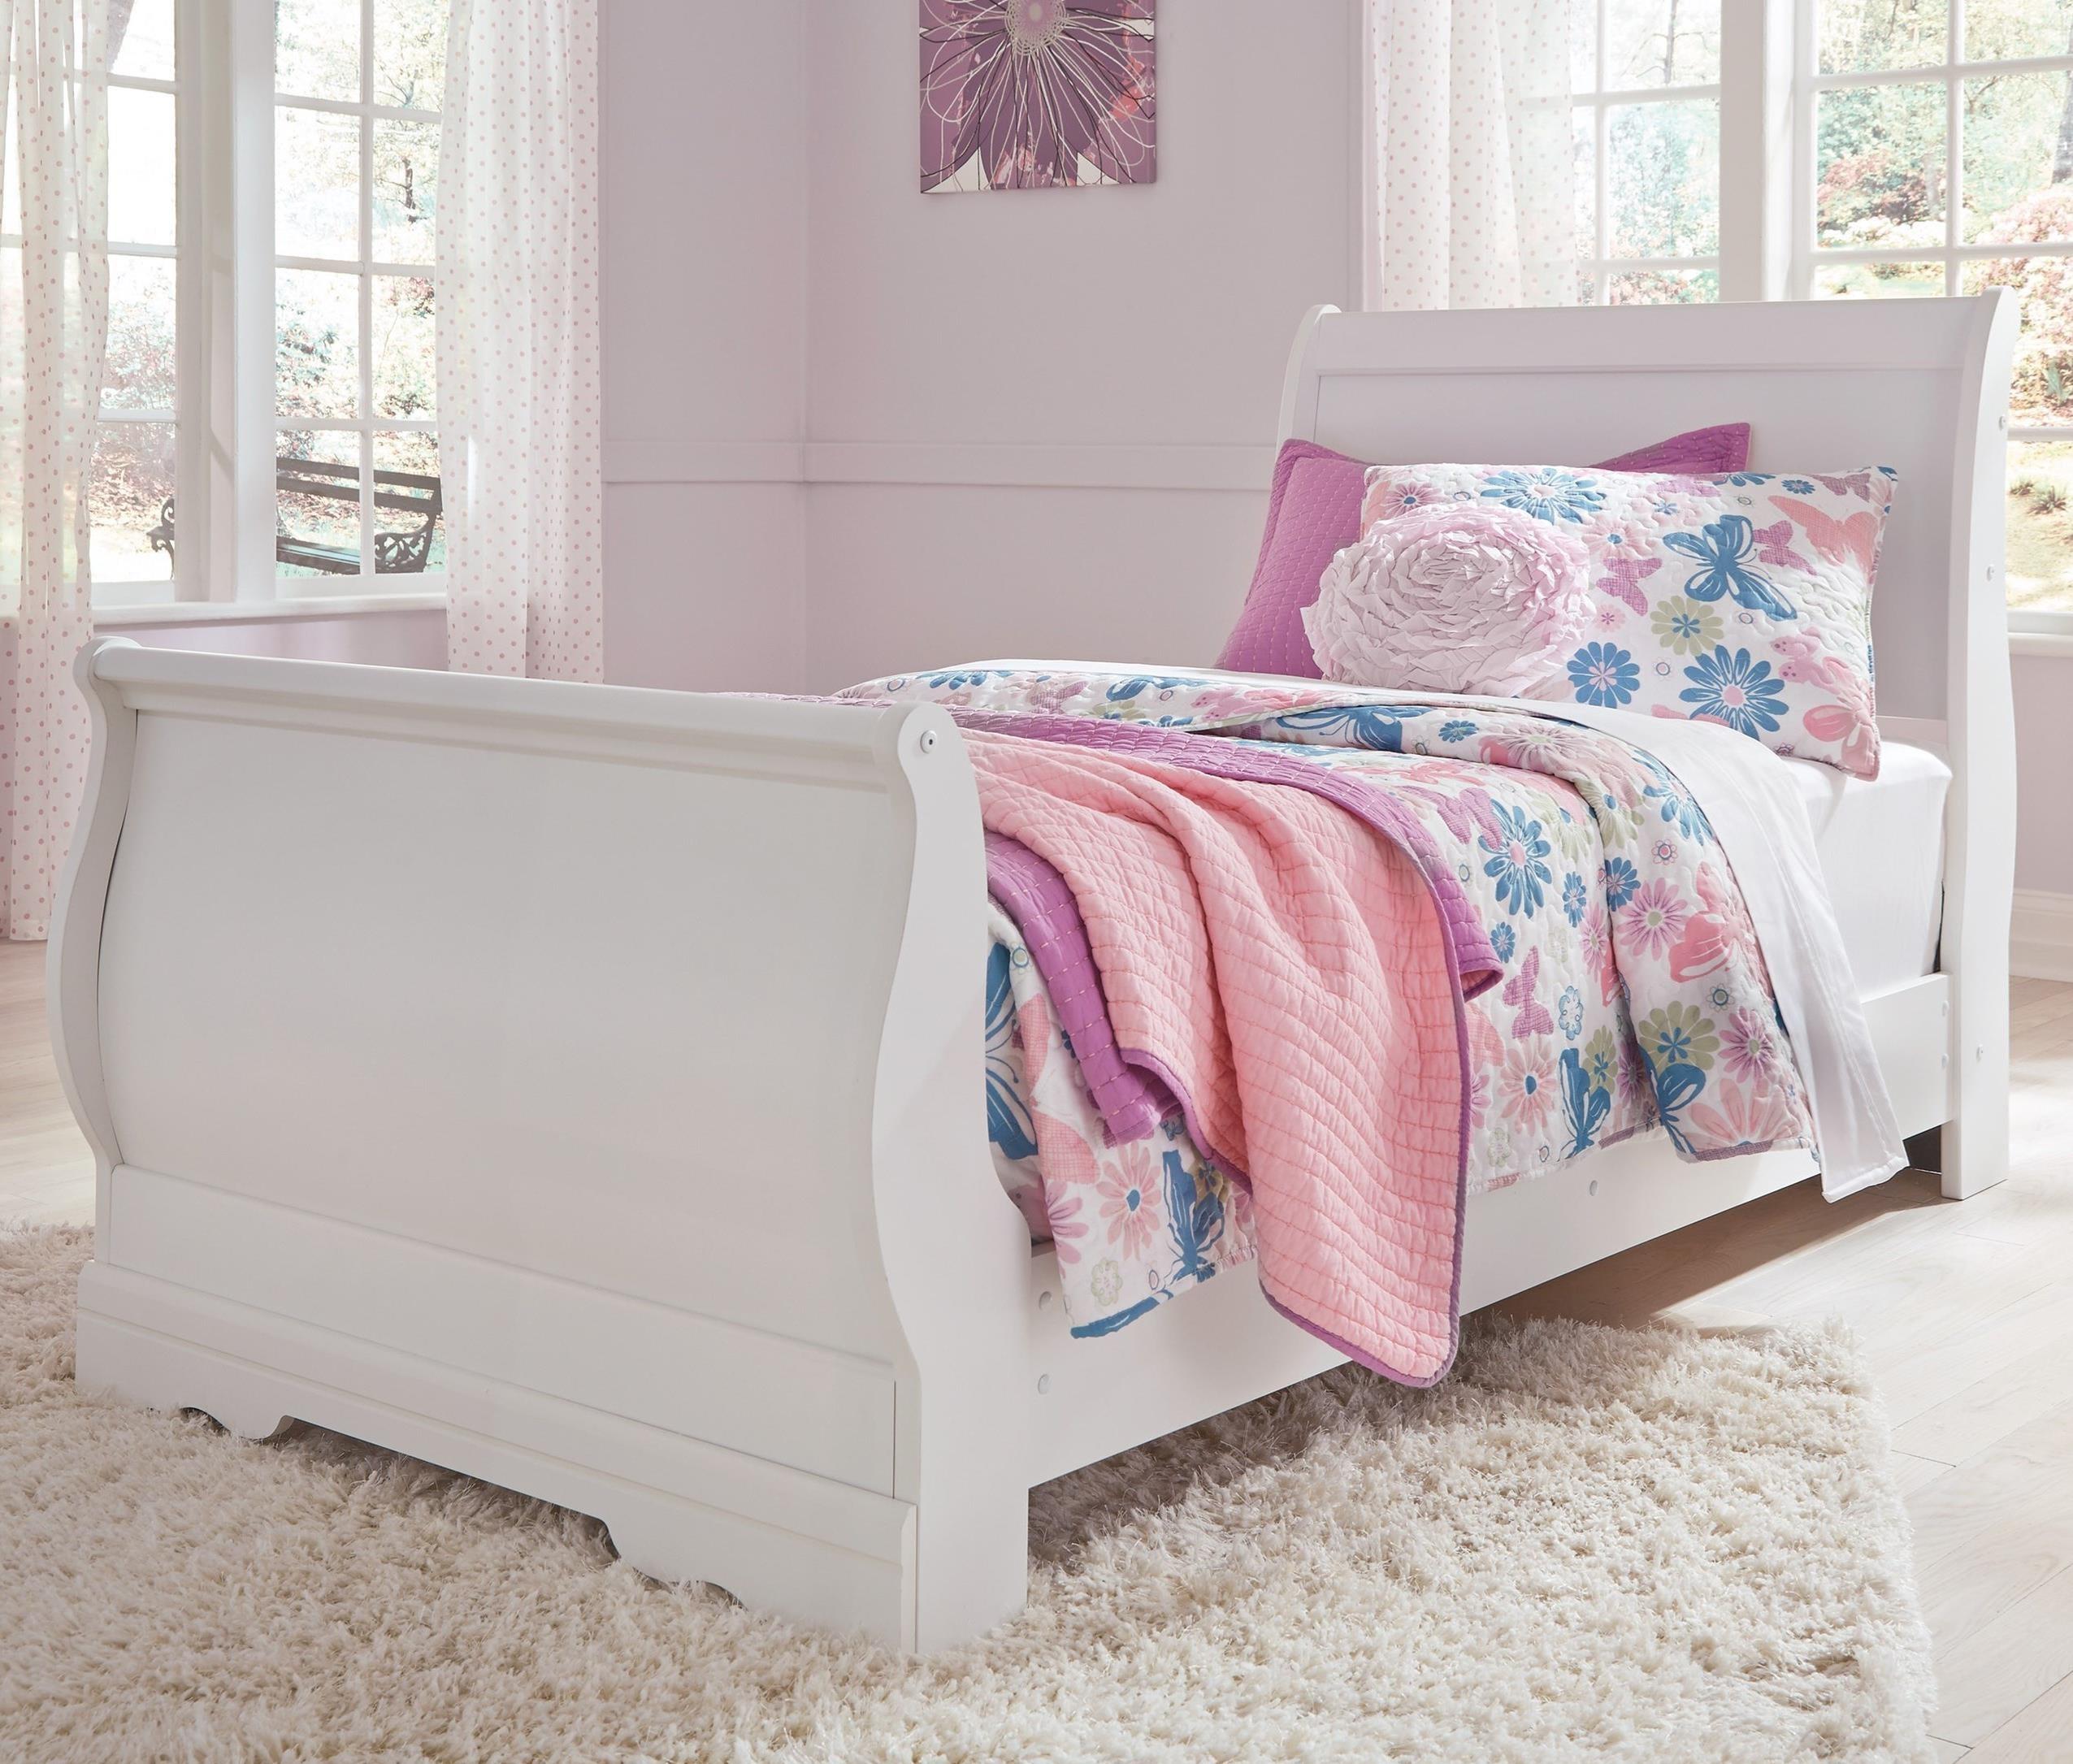 Anarasia Twin Sleigh Bed by Ashley (Signature Design) at Johnny Janosik